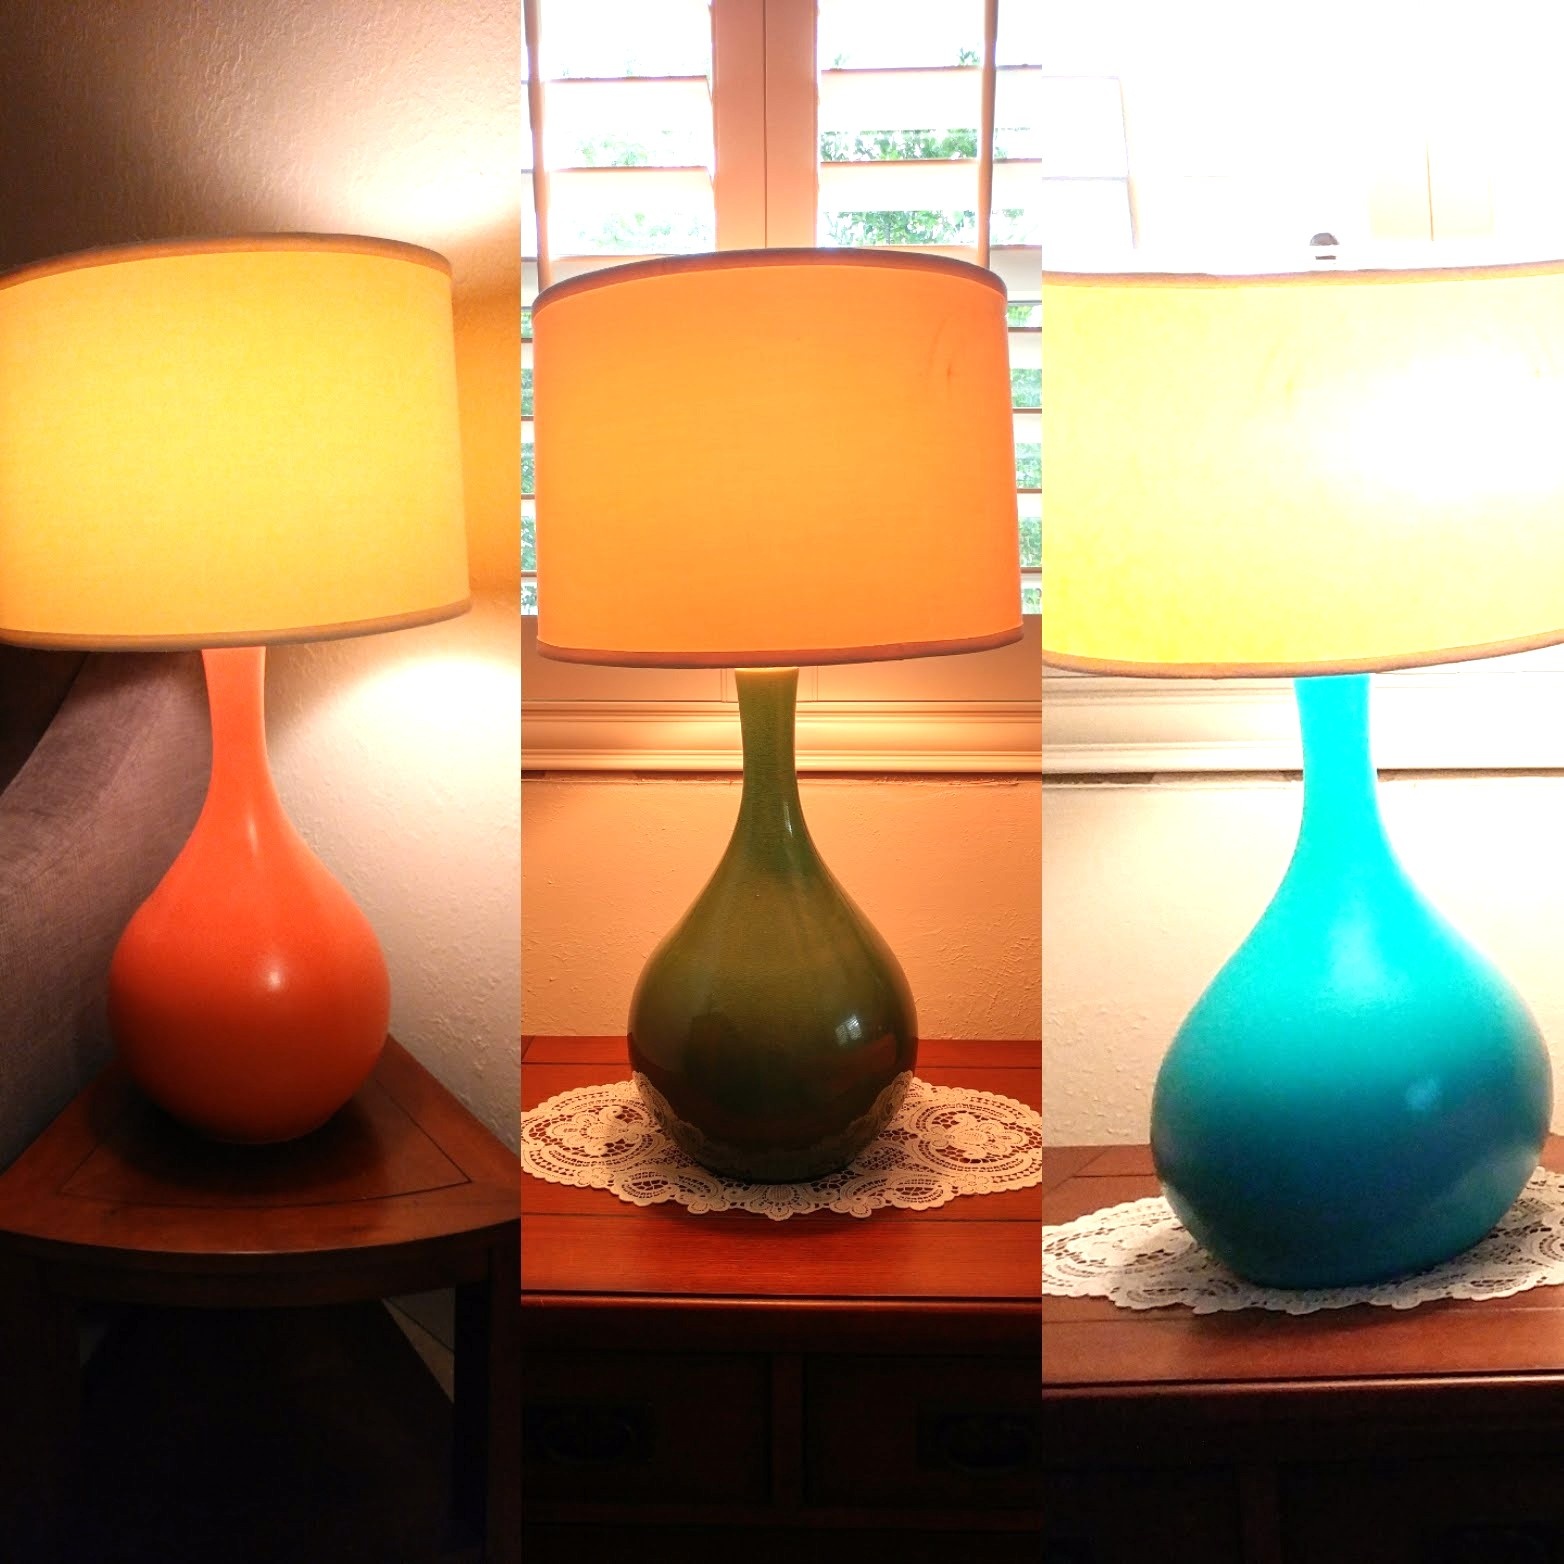 Admirable Diy Lamps Diy Lamps Meghan On Move Mid Century Lamp Parts Mid Century Lamp Table houzz-03 Mid Century Lamp